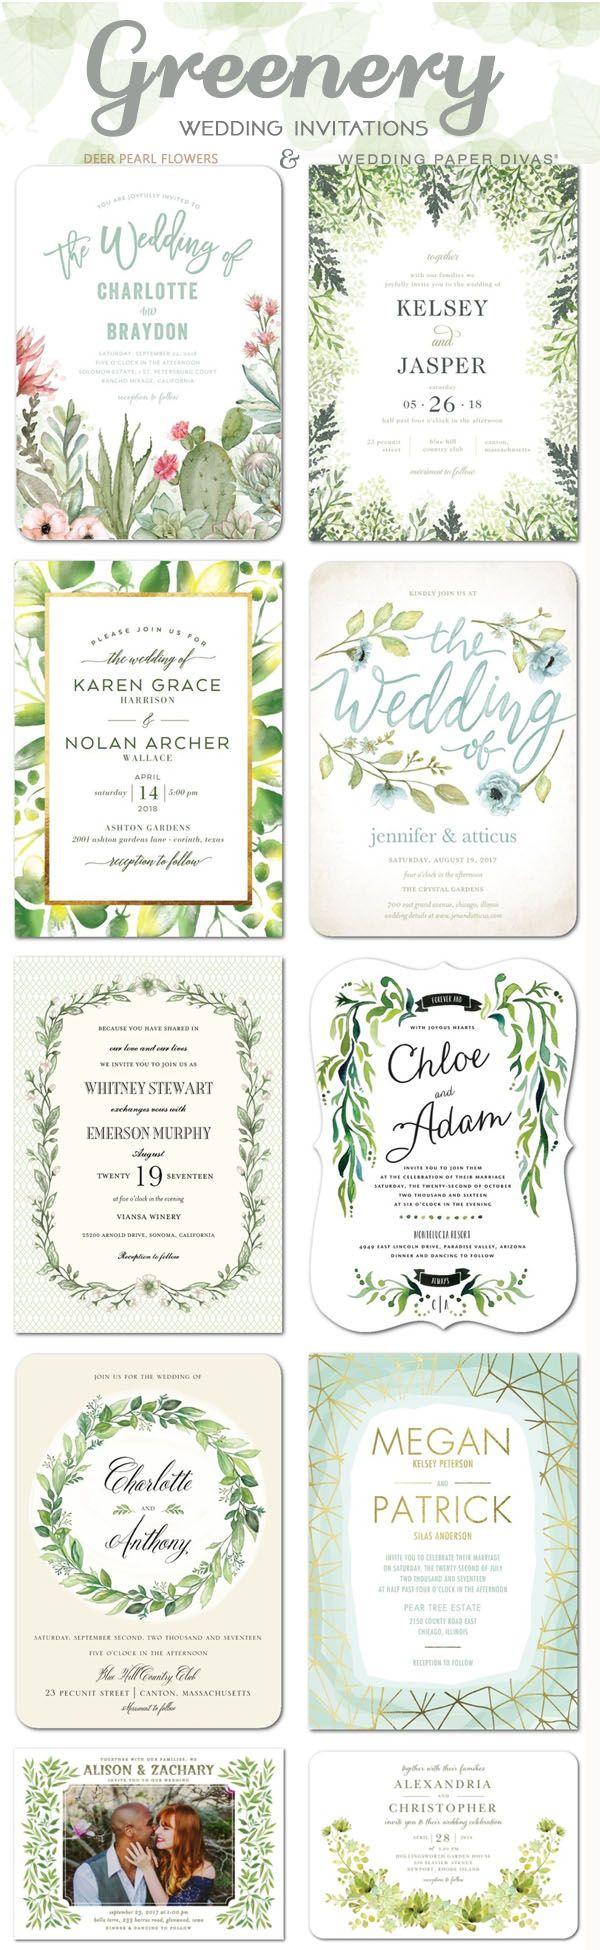 wedding trends greenery wedding decor ideas inspirations